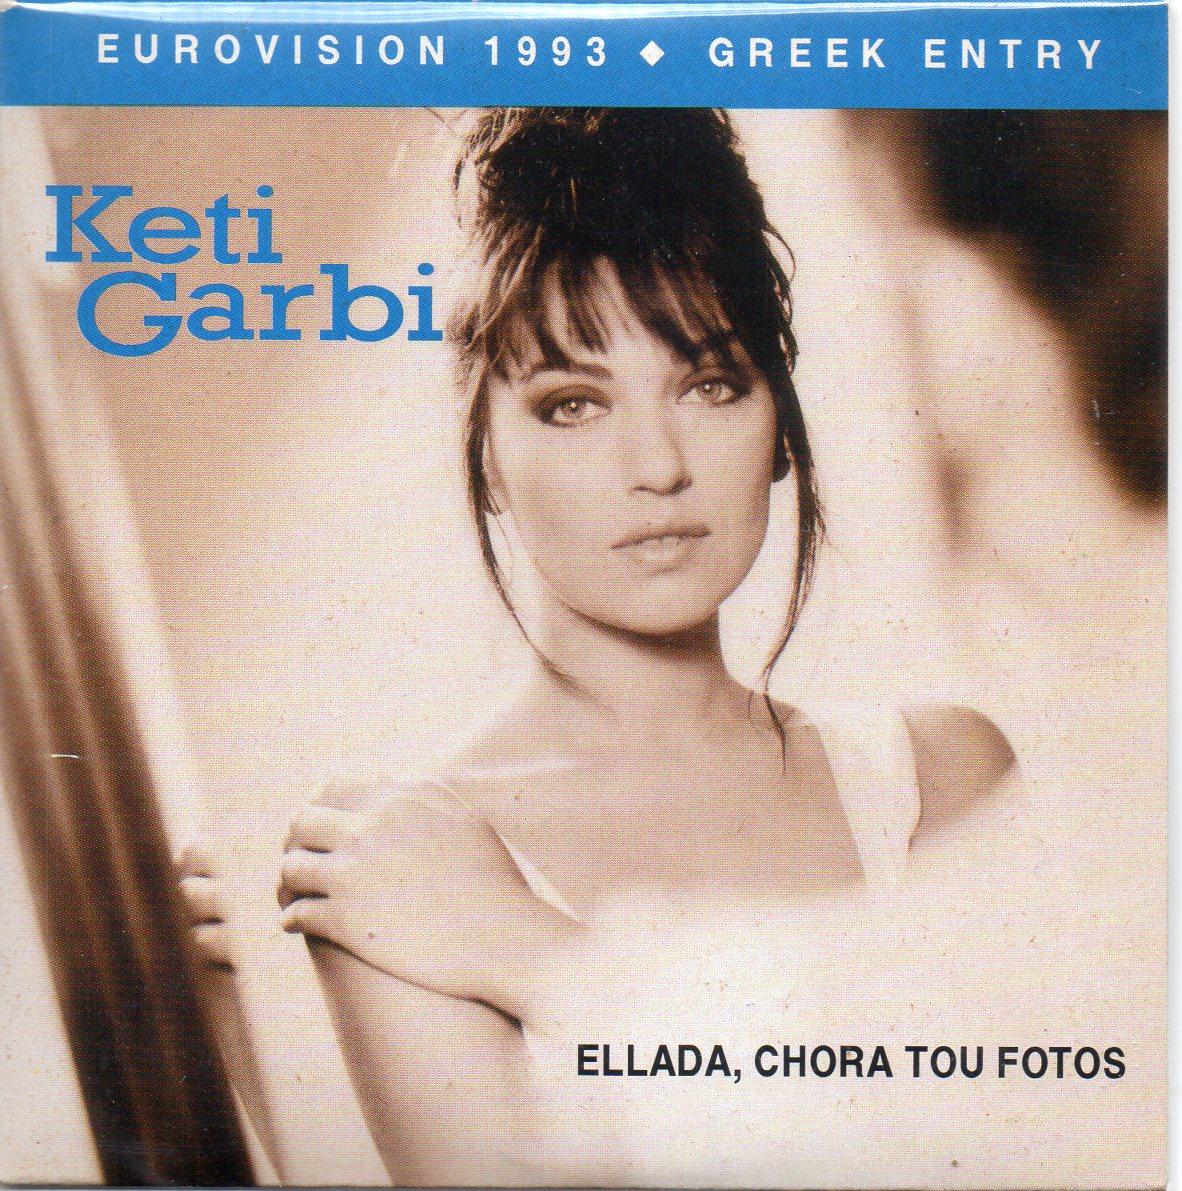 EUROVISION 1993 GRÈCE : KETI GARBI - Ellada, Chora Tou Fotos 2-track CARD SLEEVE - CD single